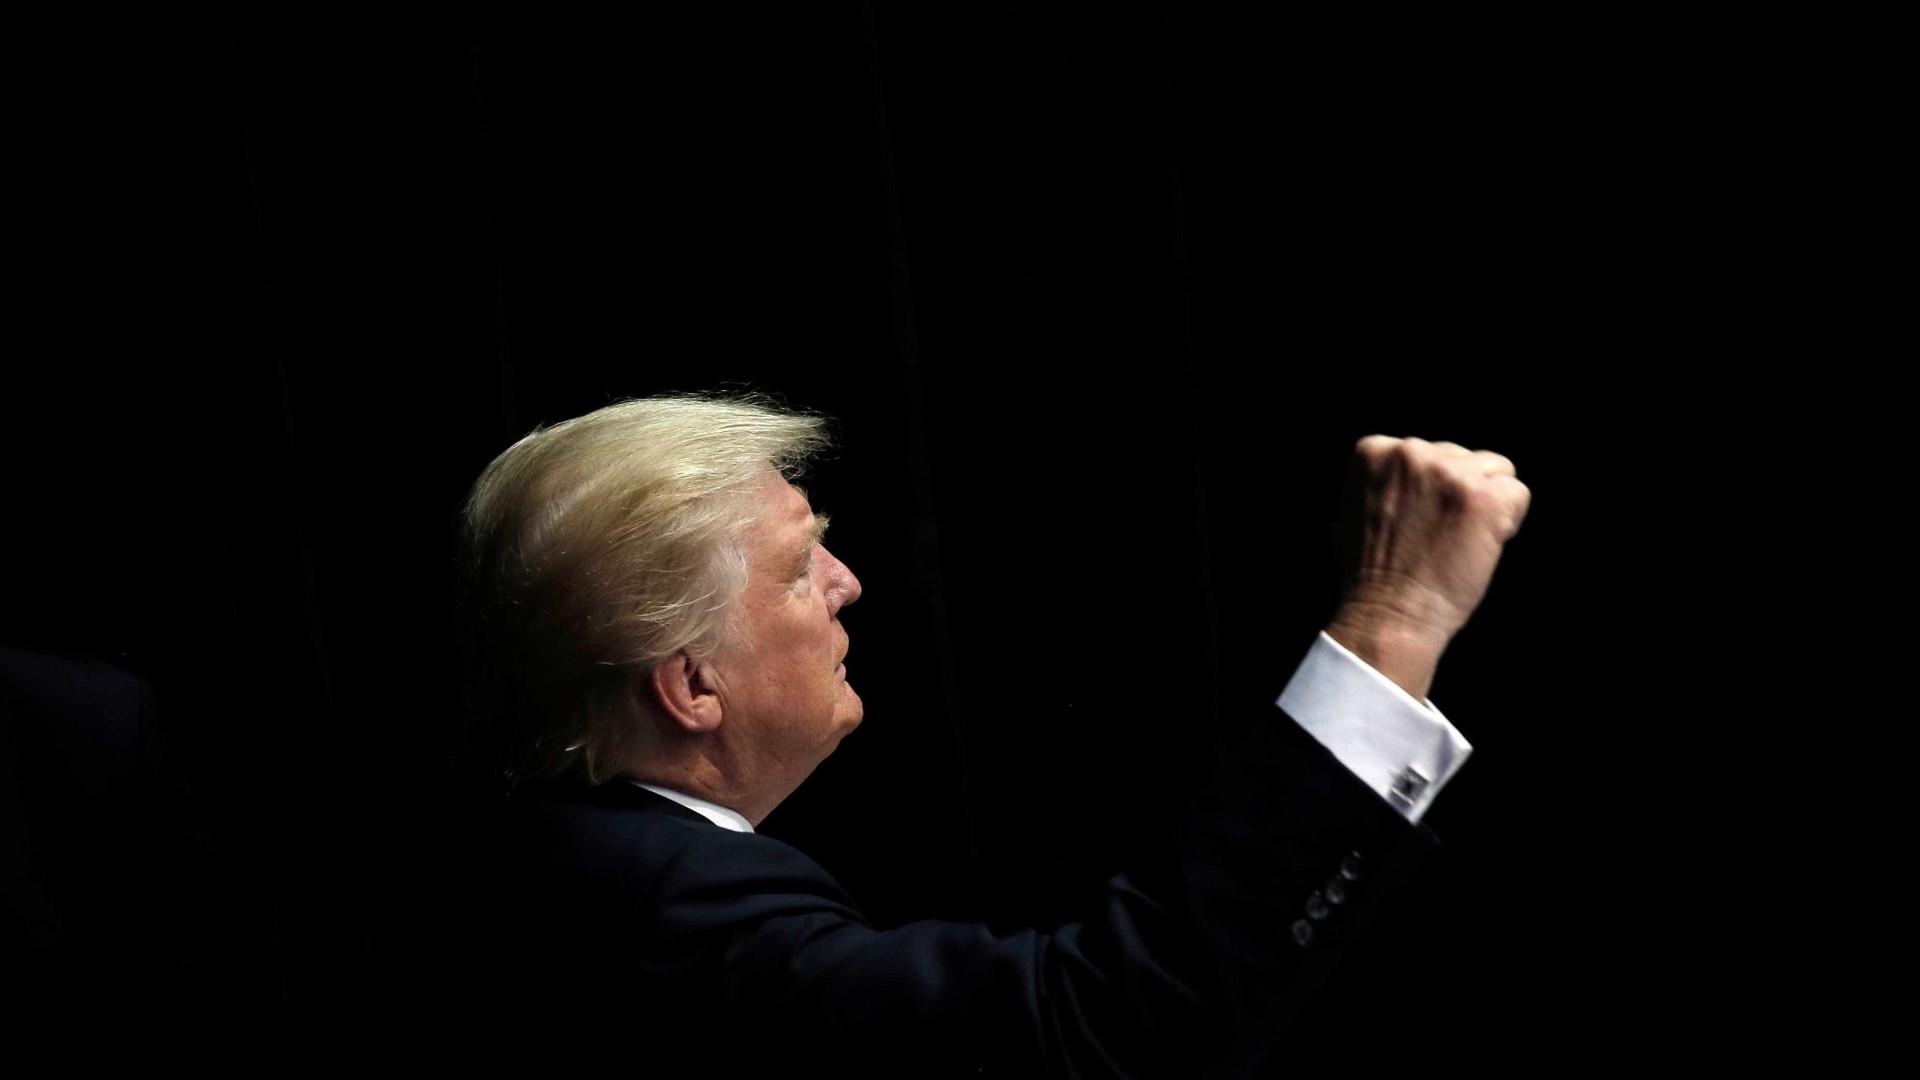 Donald Trump saiu fragilizado das eleições intercalares de novembro